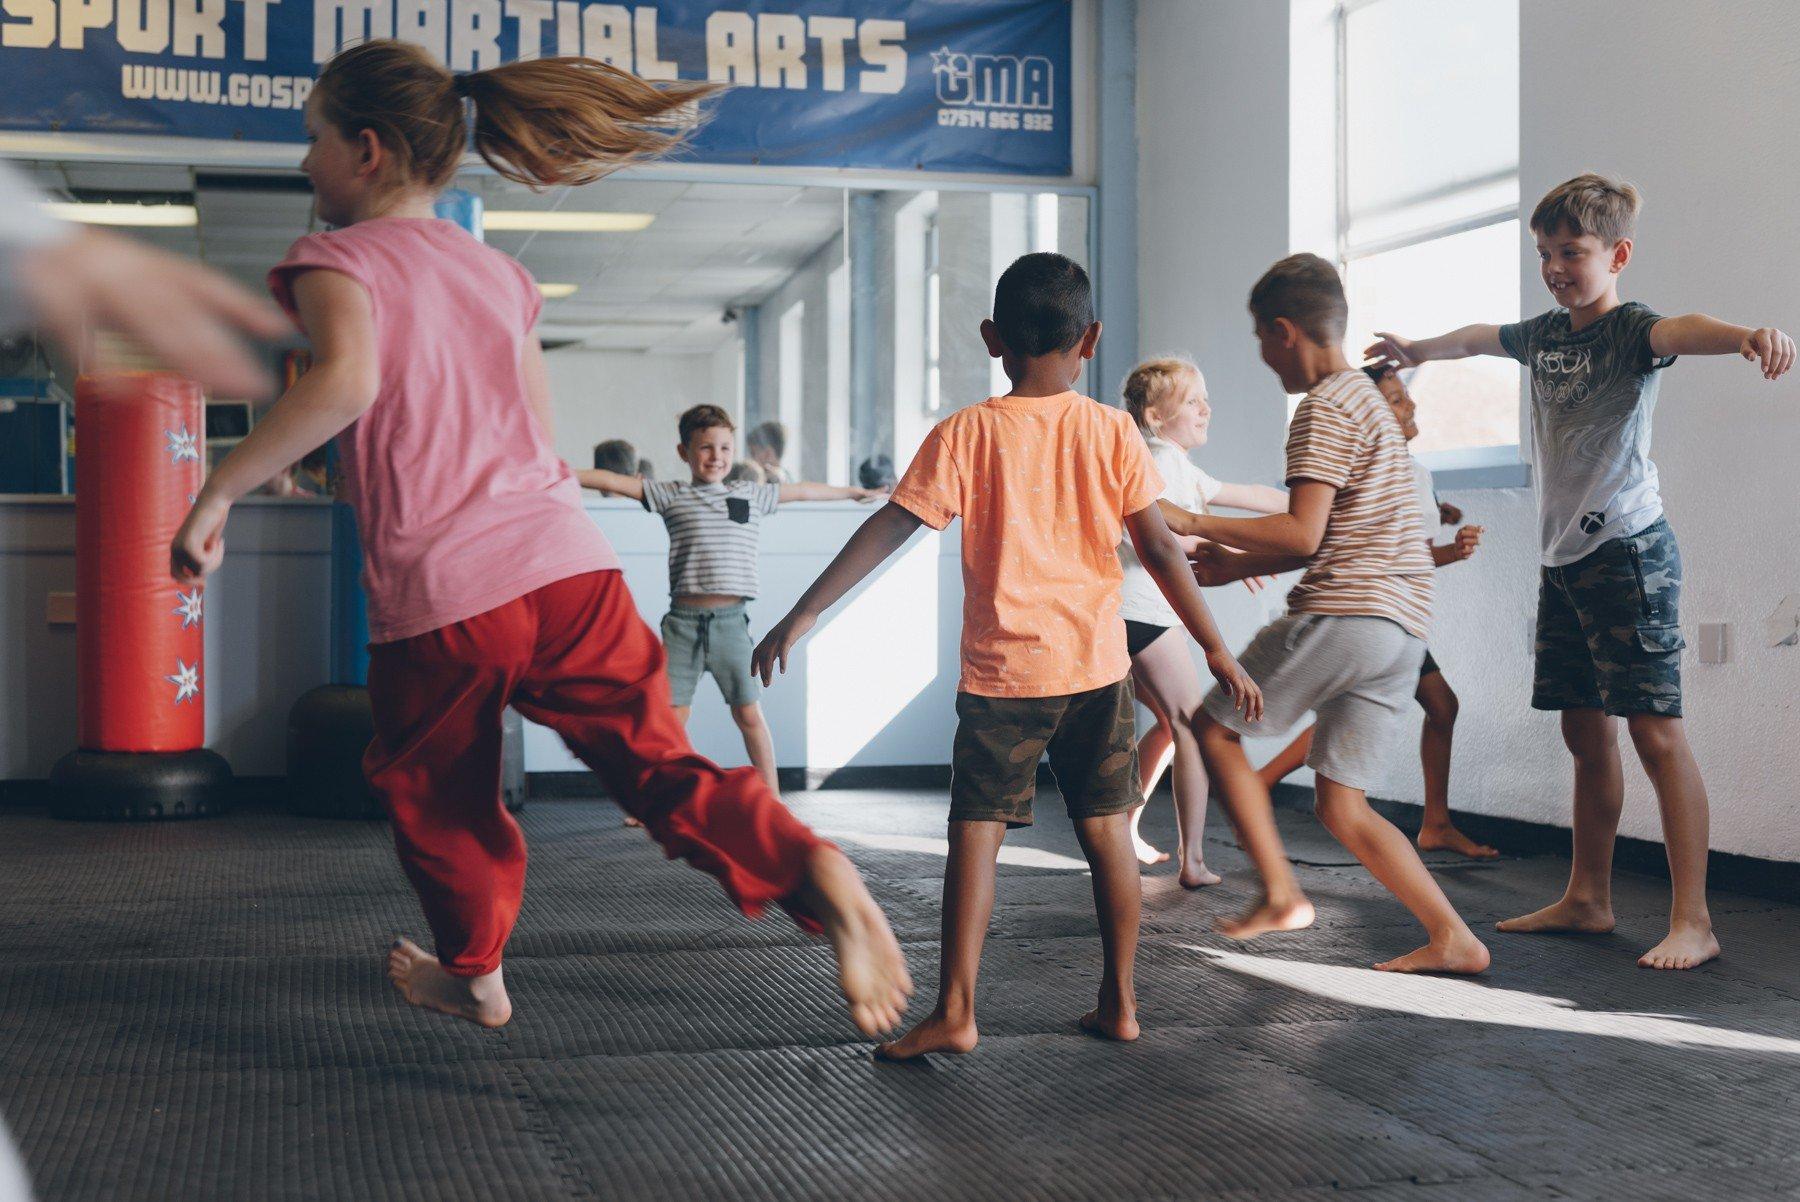 gosport martial arts kids fitness classes